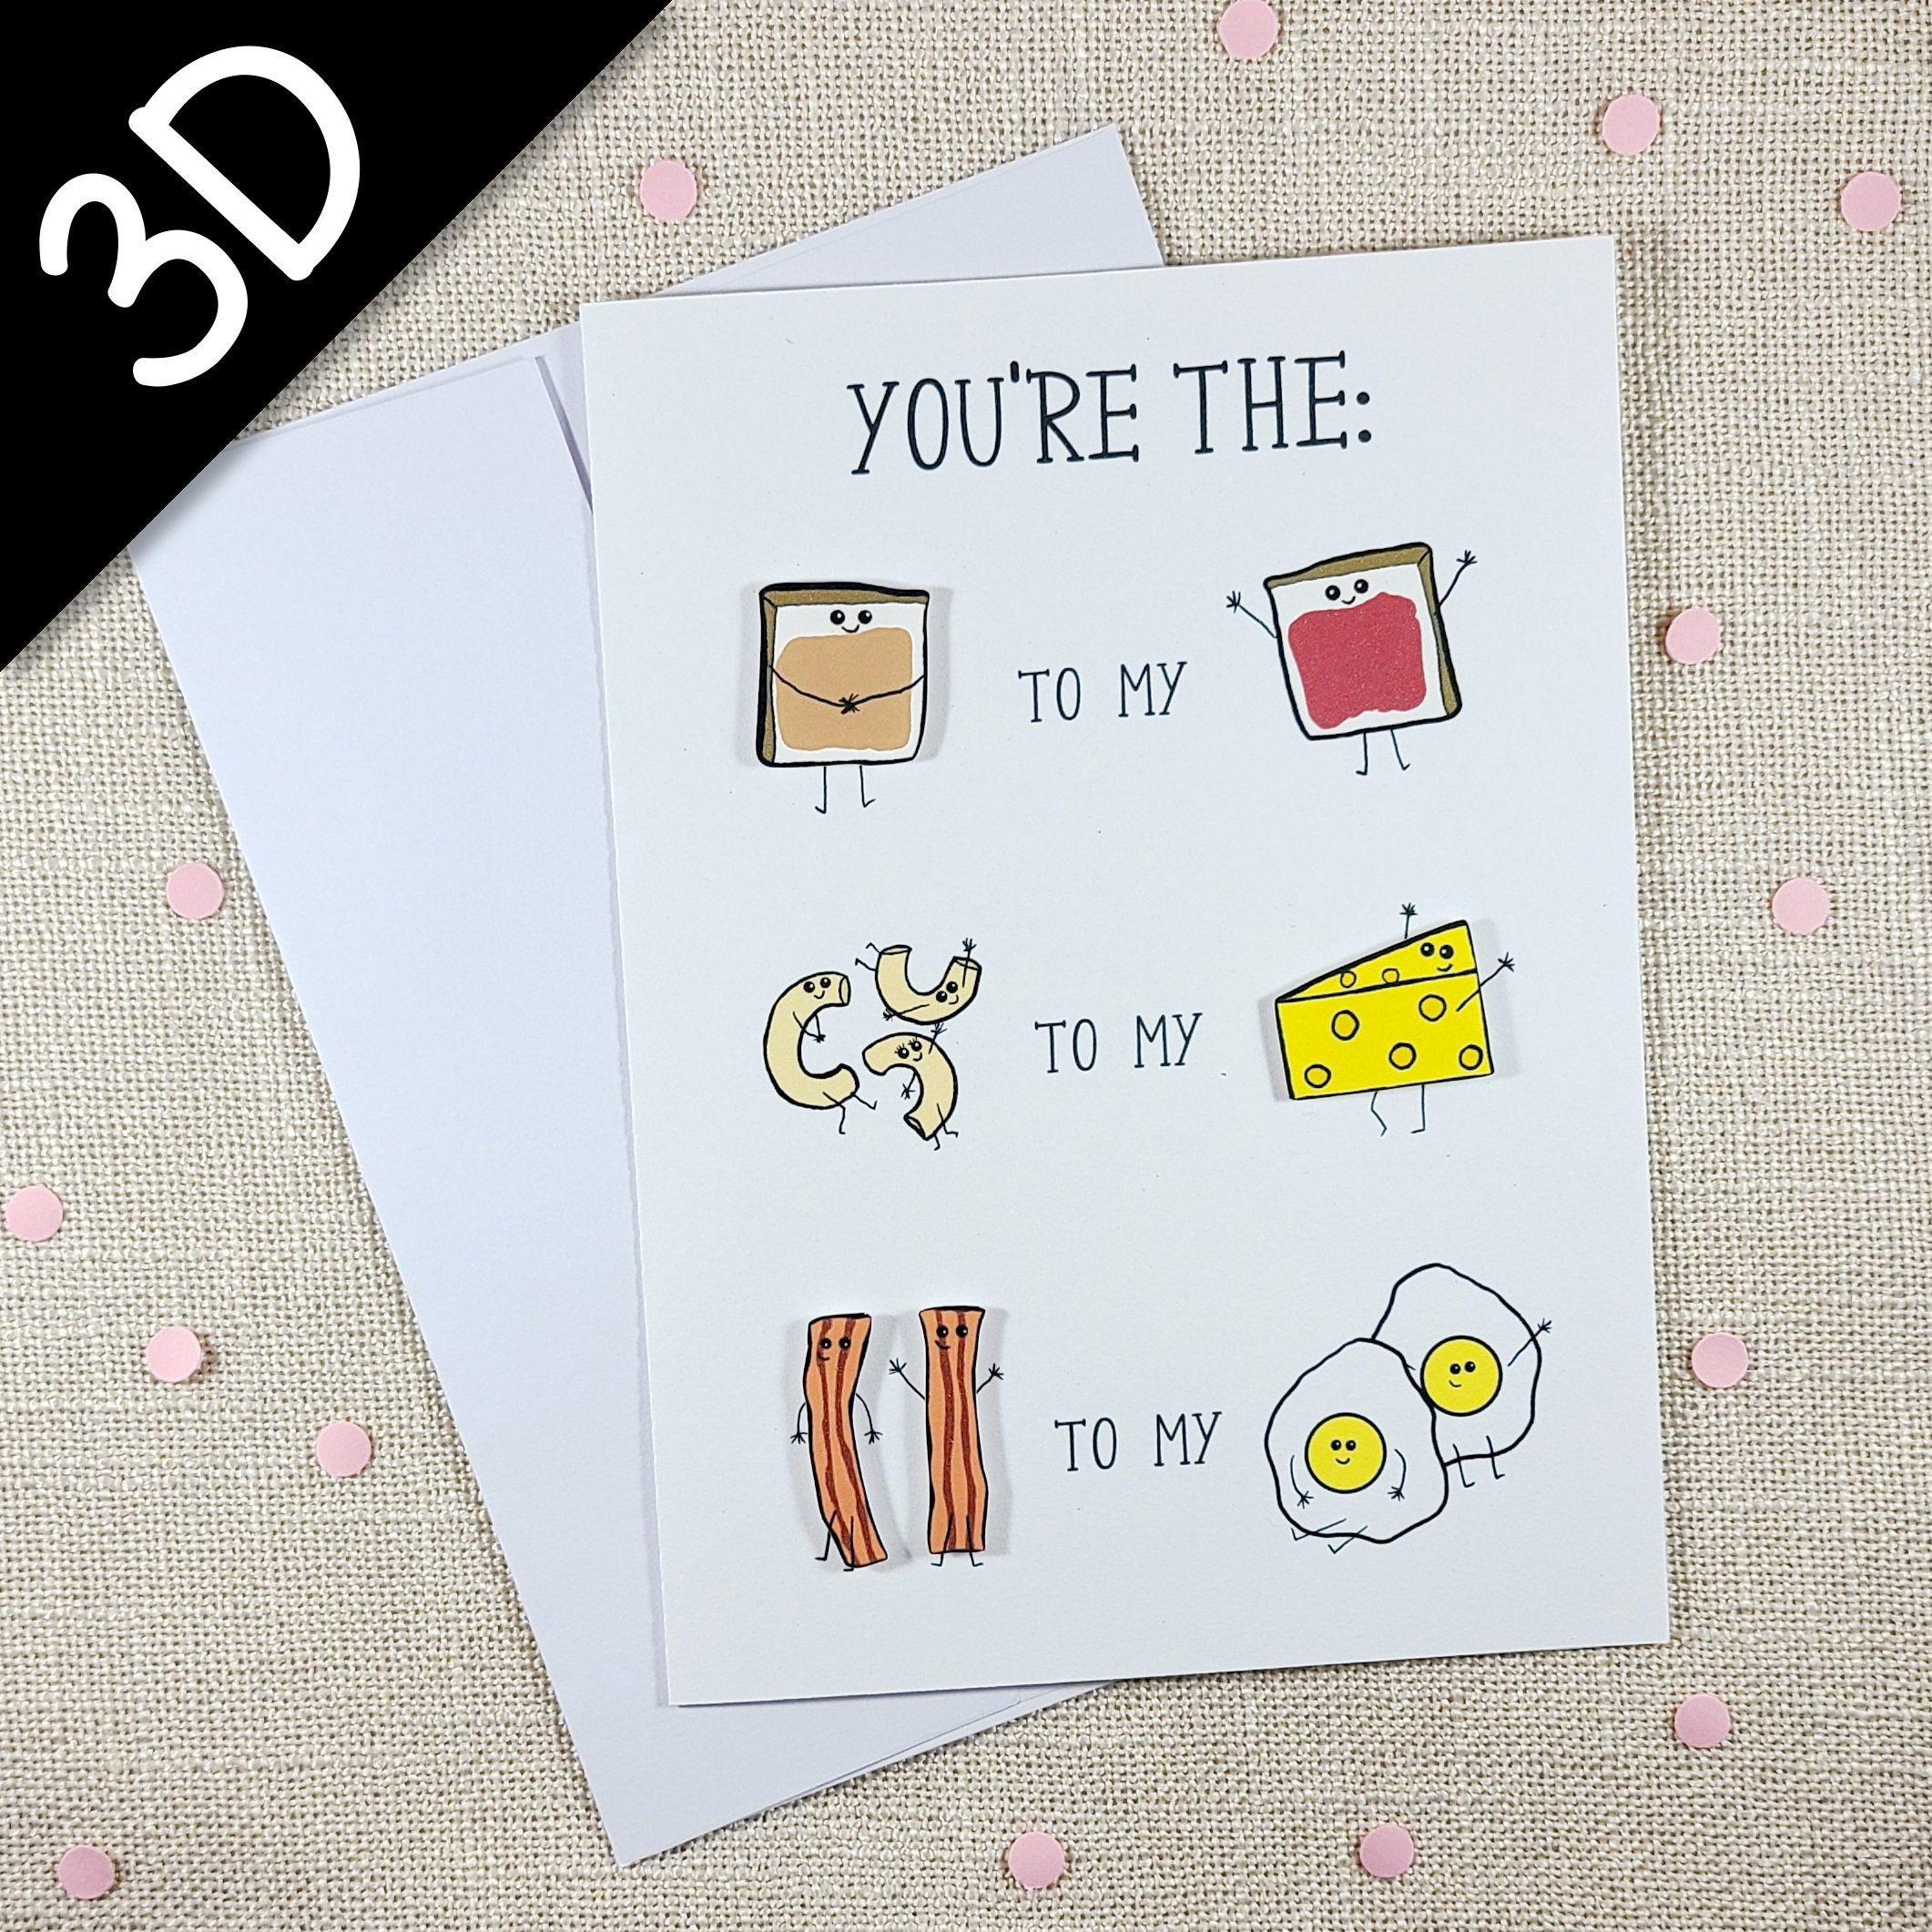 Perfect Pair Funny Cute Card Love Card Card For Best Friend Anniversary Card Handmade Greeting Card Kawaii Card Best Friend Birthday Cards Best Friend Cards Friend Valentine Card